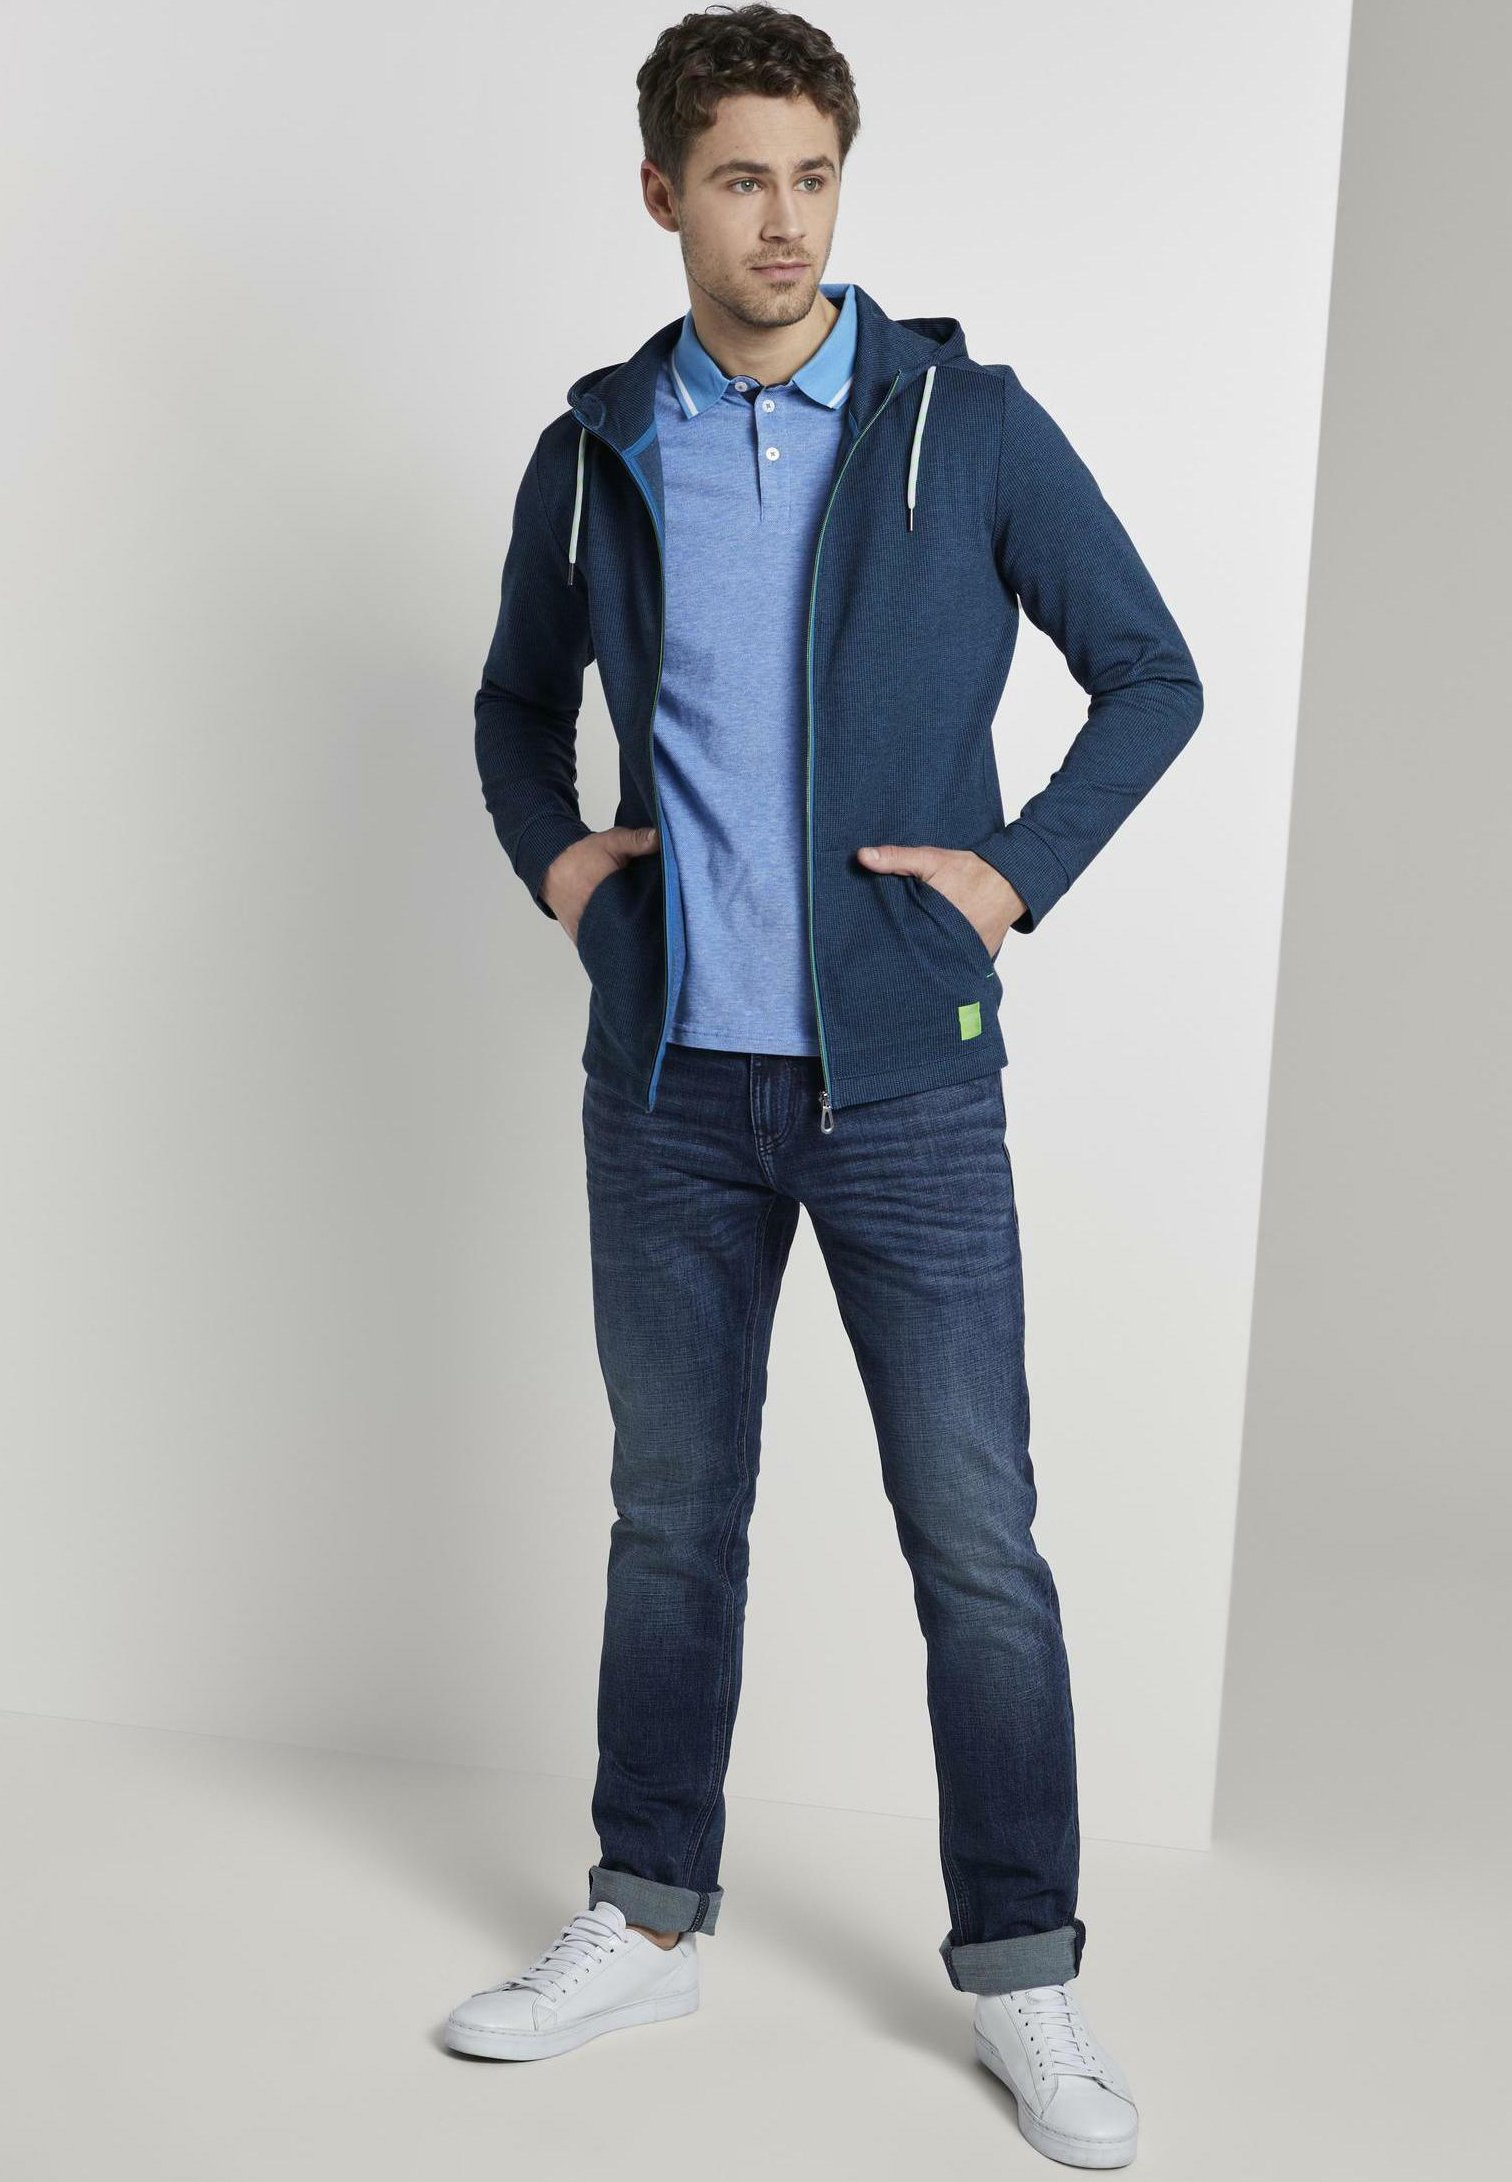 Tom Tailor T-shirt Gemusterte Kapuzenjacke Aus Jersey - Vest Blue 1Thl7AY